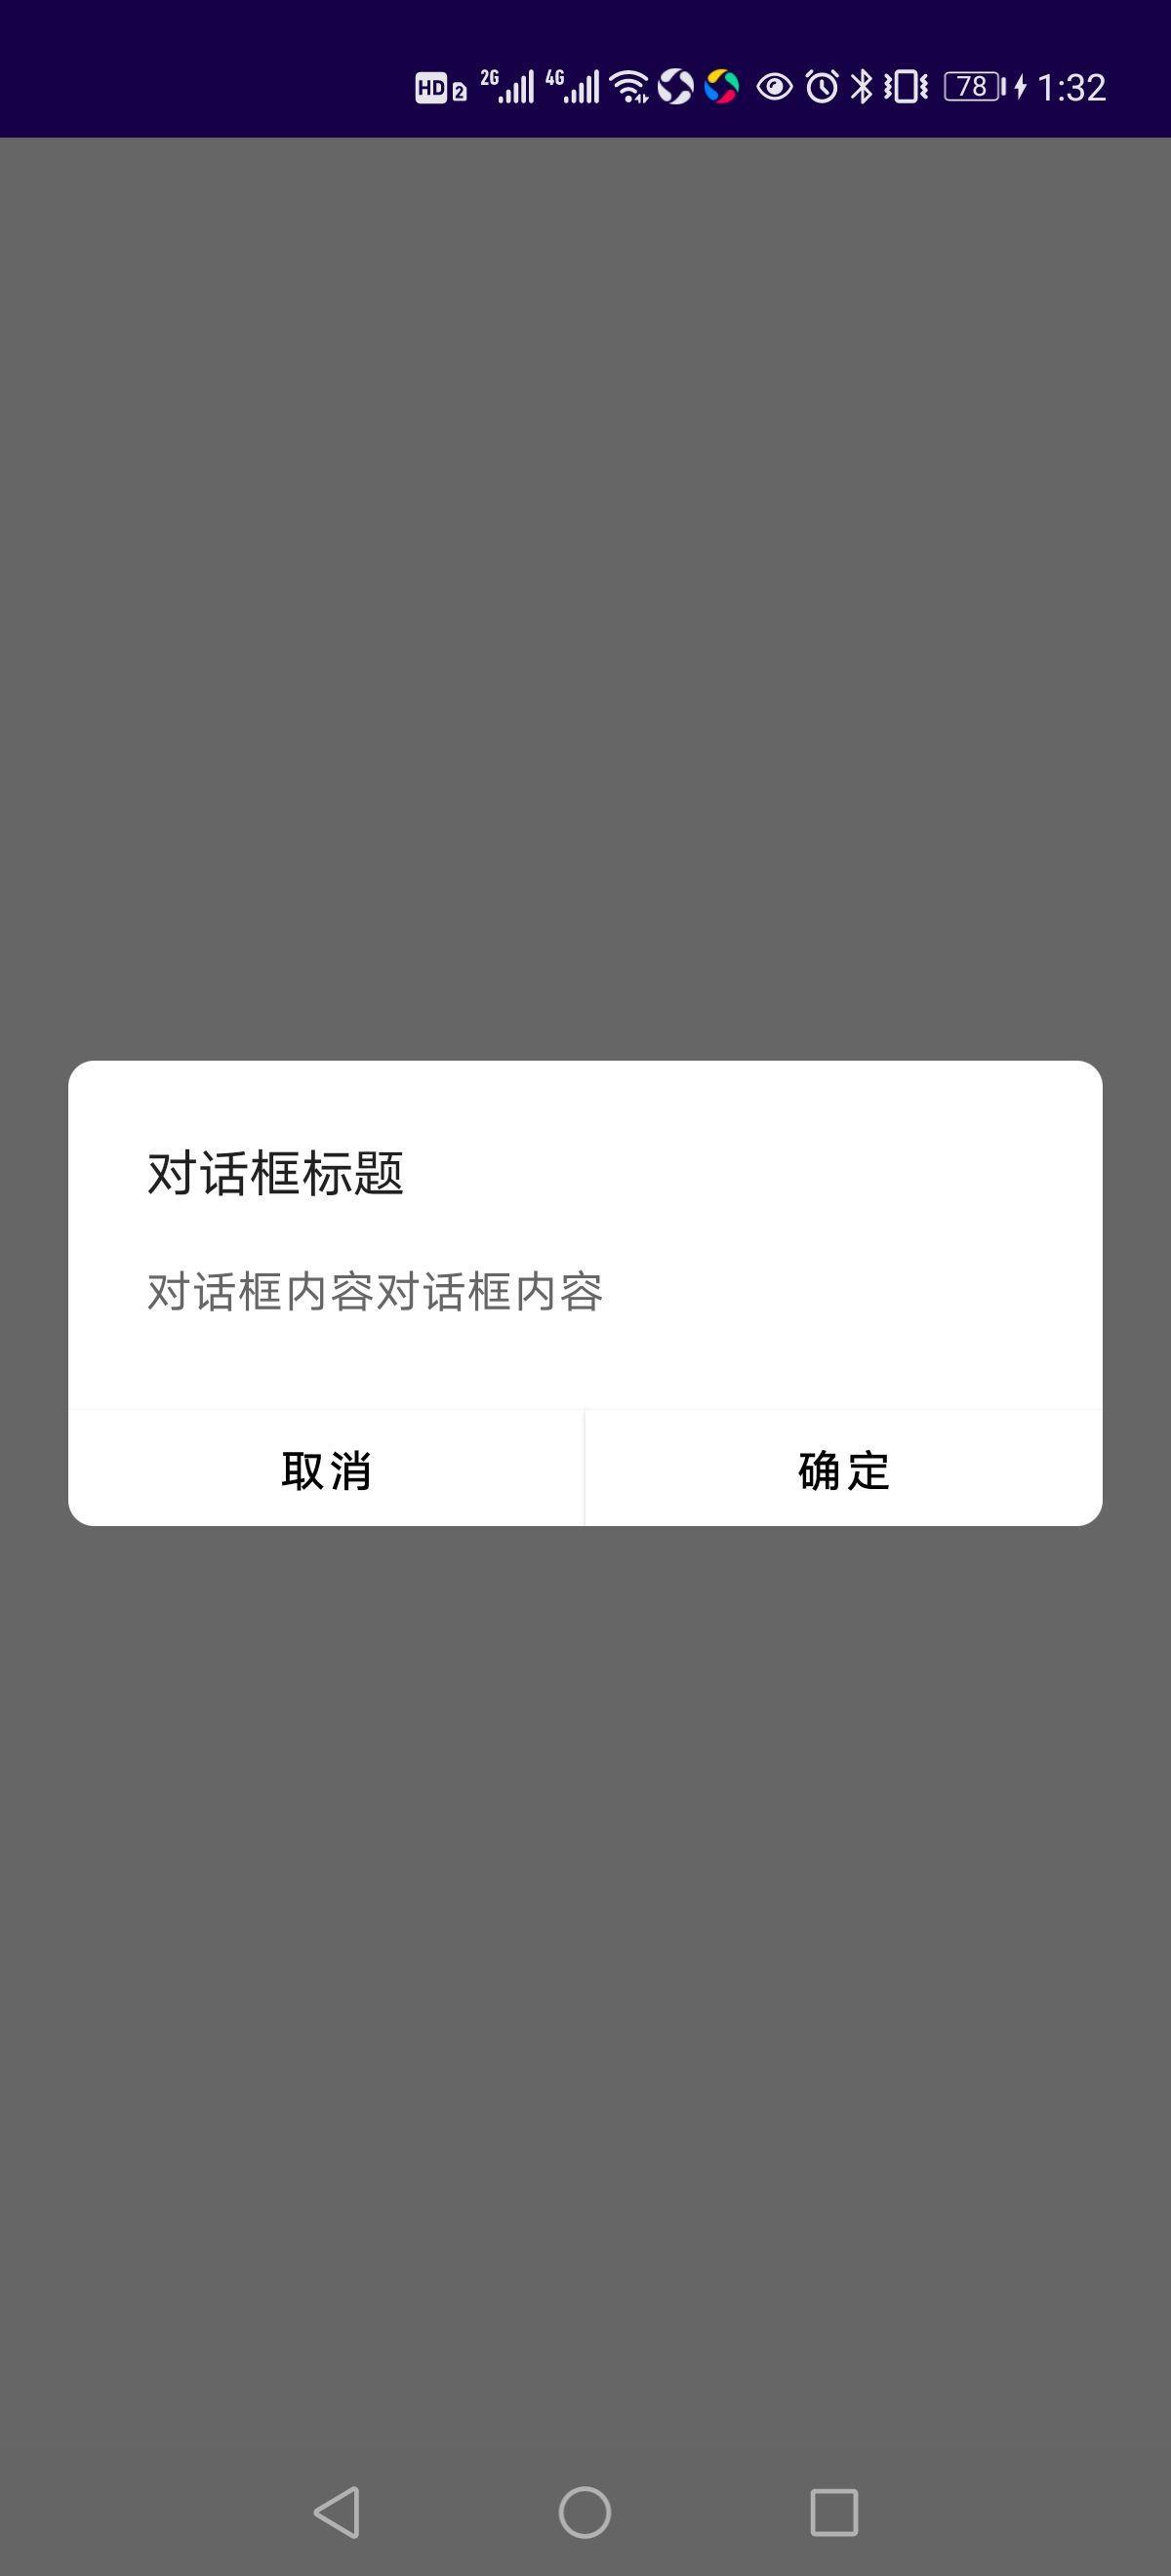 Screenshot_20210512_133255_alertdialog.jpg